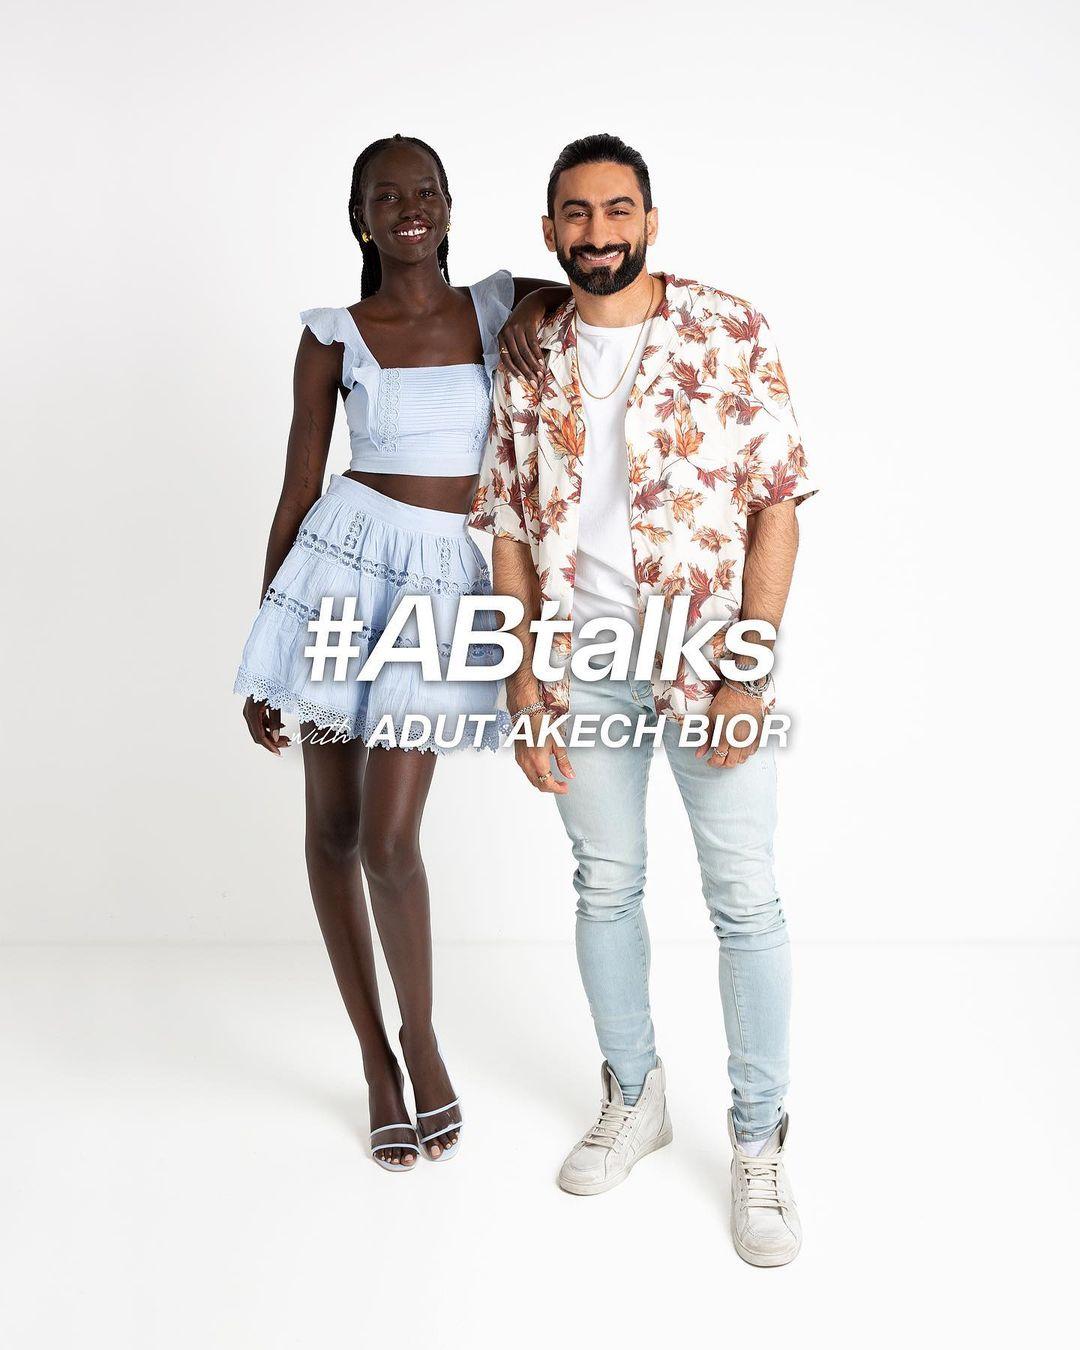 adut-akech-anas-bukhash-abtalks-inspiration-quotes-style-rave